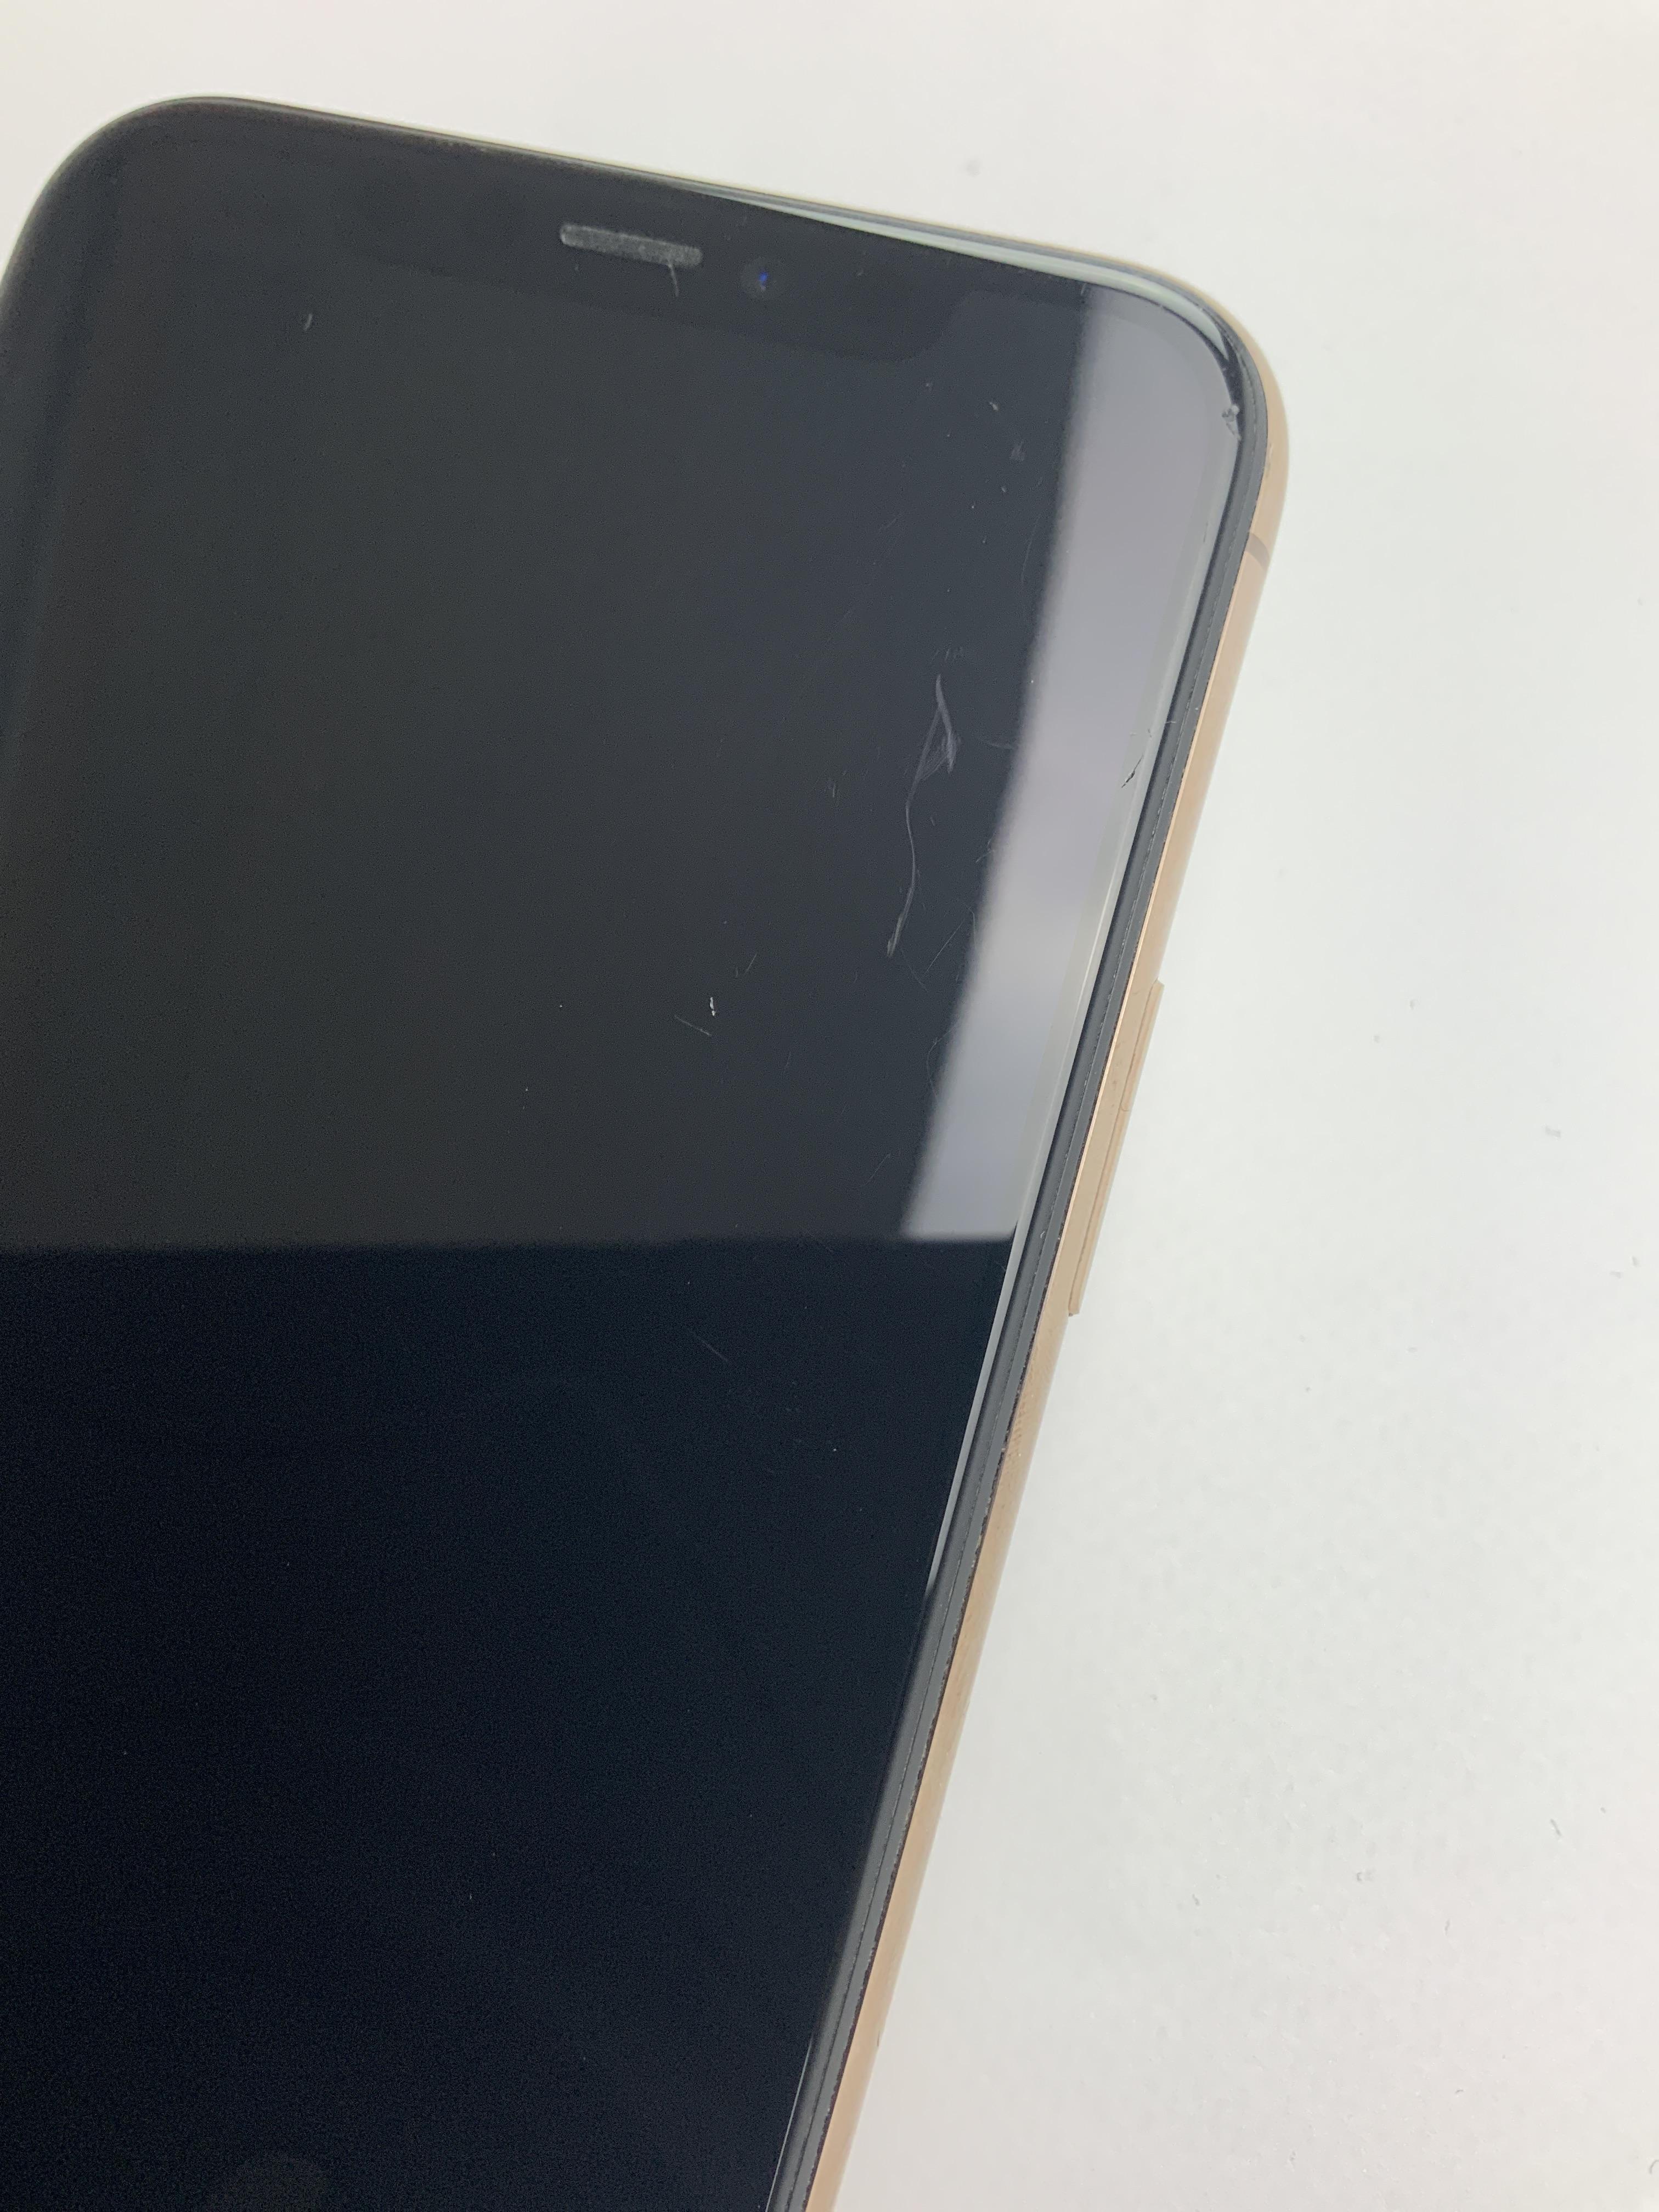 iPhone 11 Pro 64GB, 64GB, Gold, bild 5